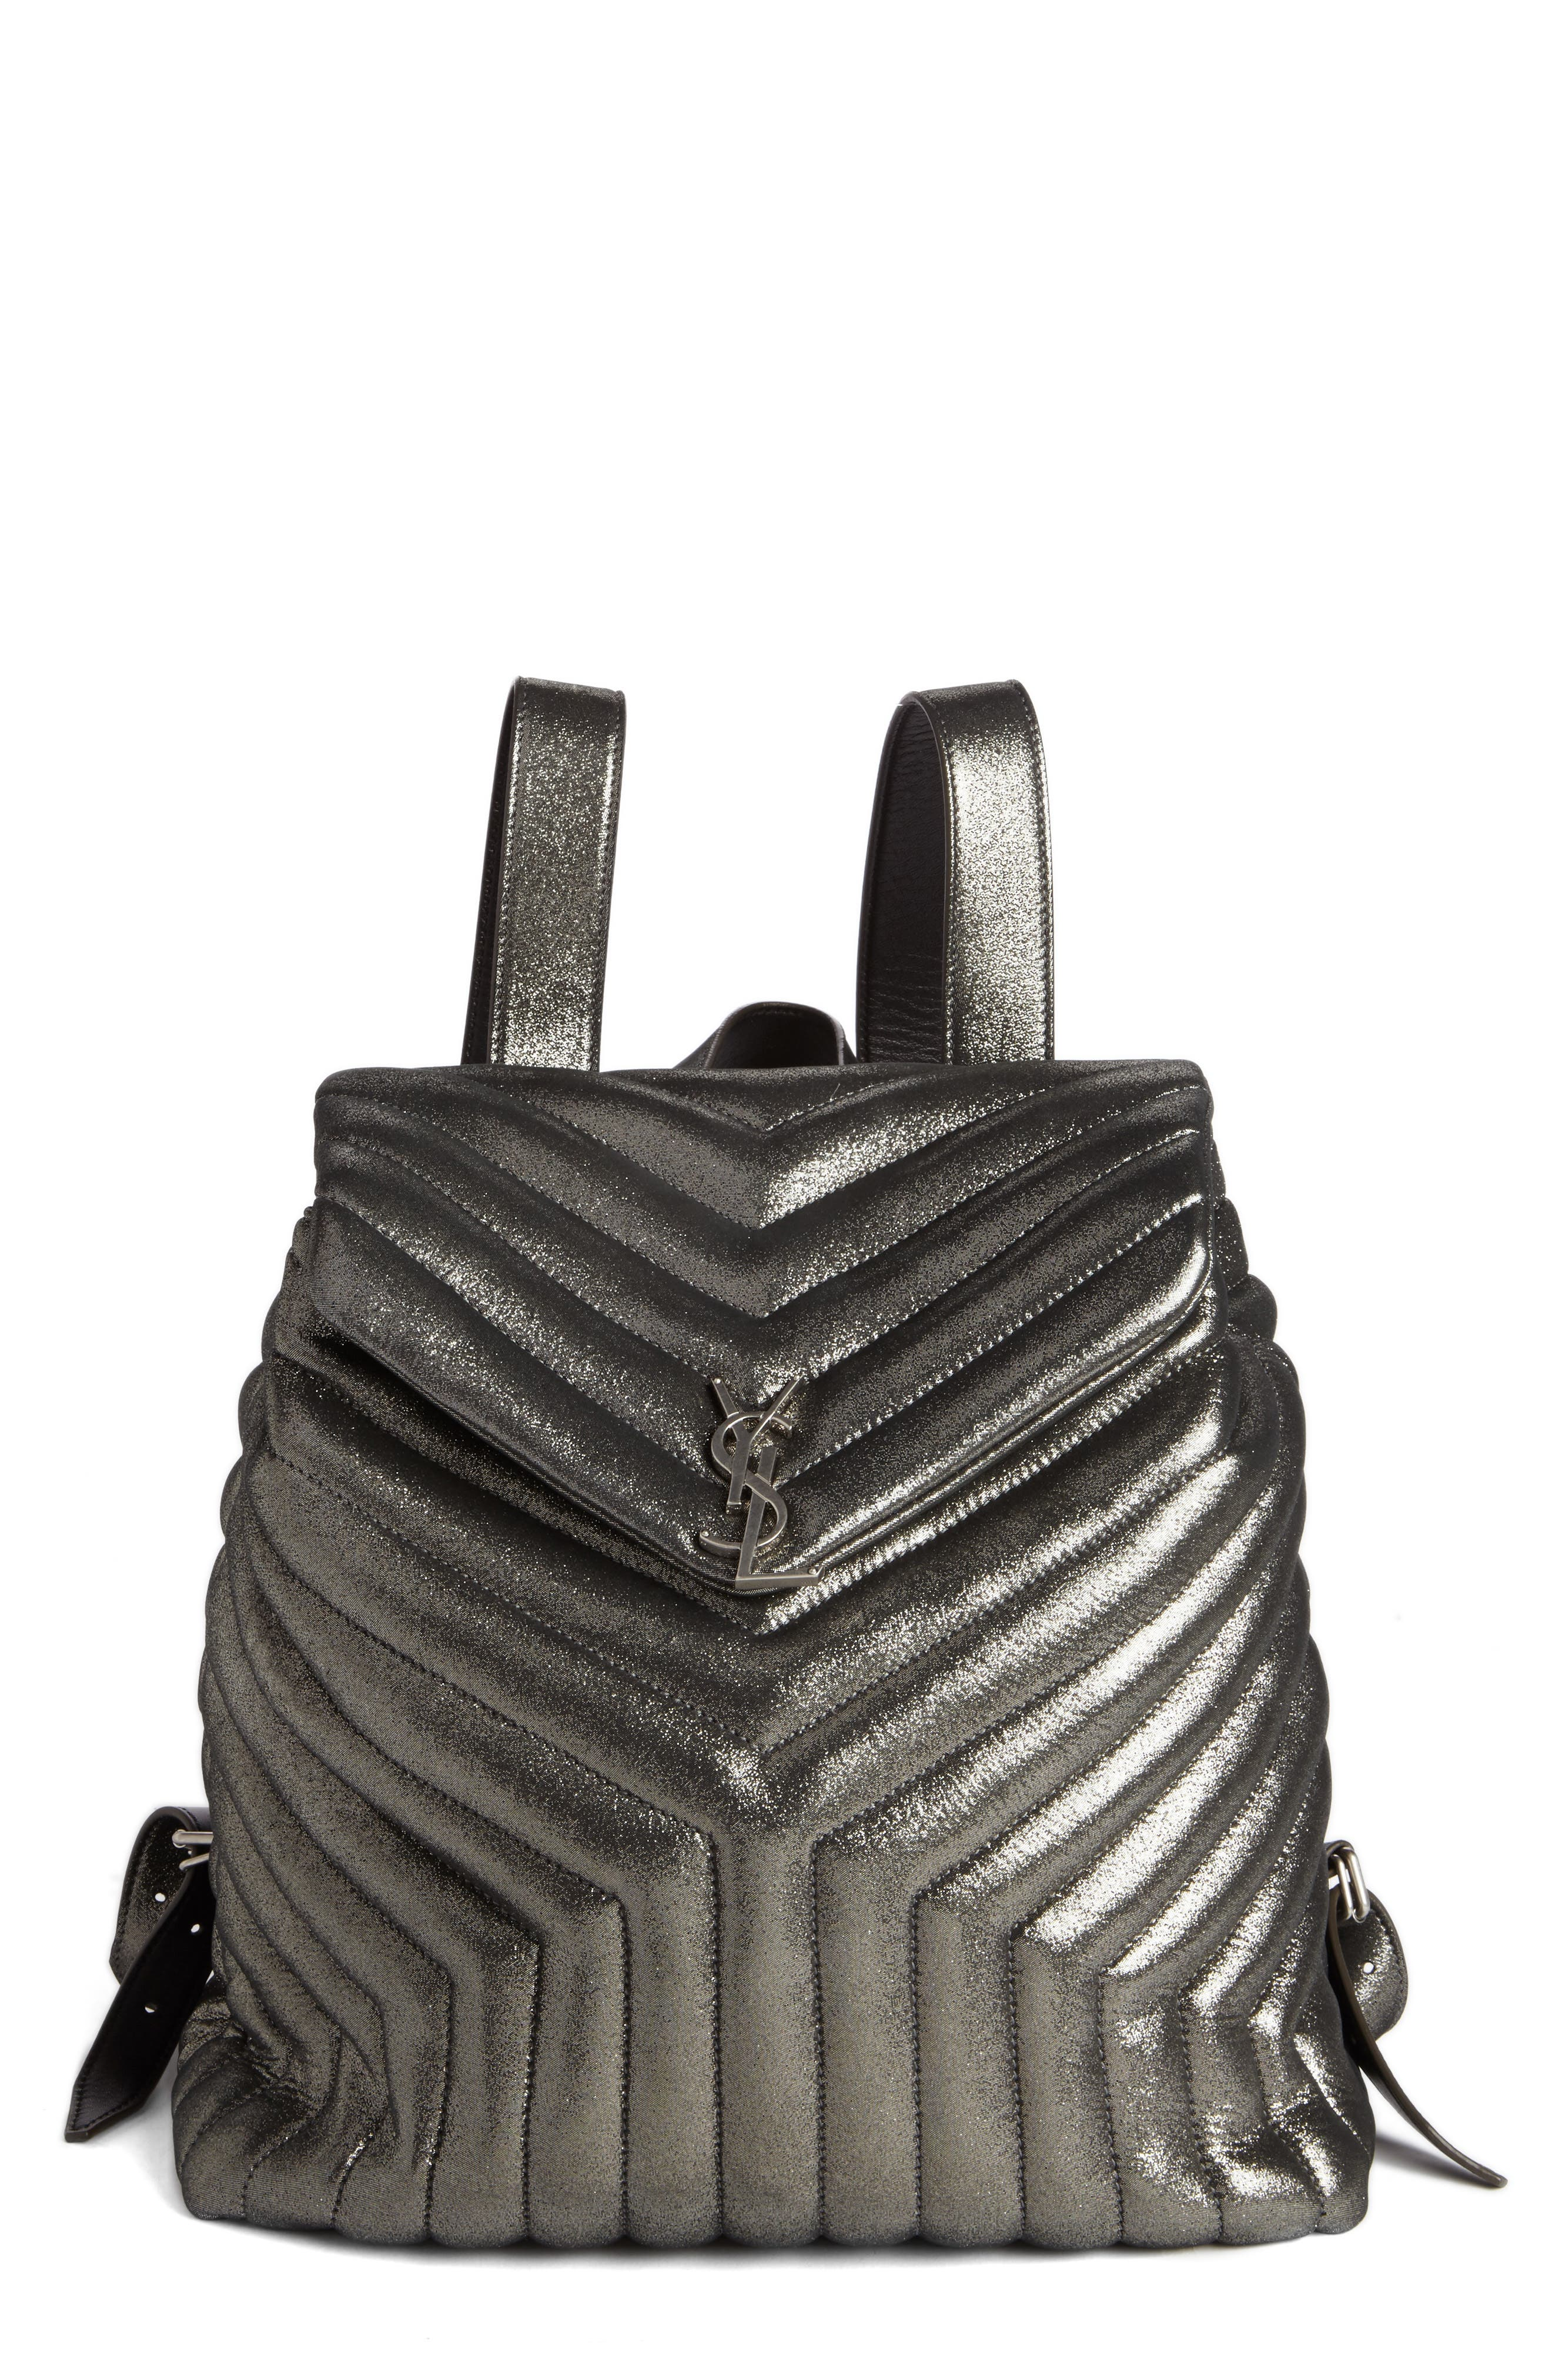 Saint Laurent Metallic Calfskin Leather Backpack